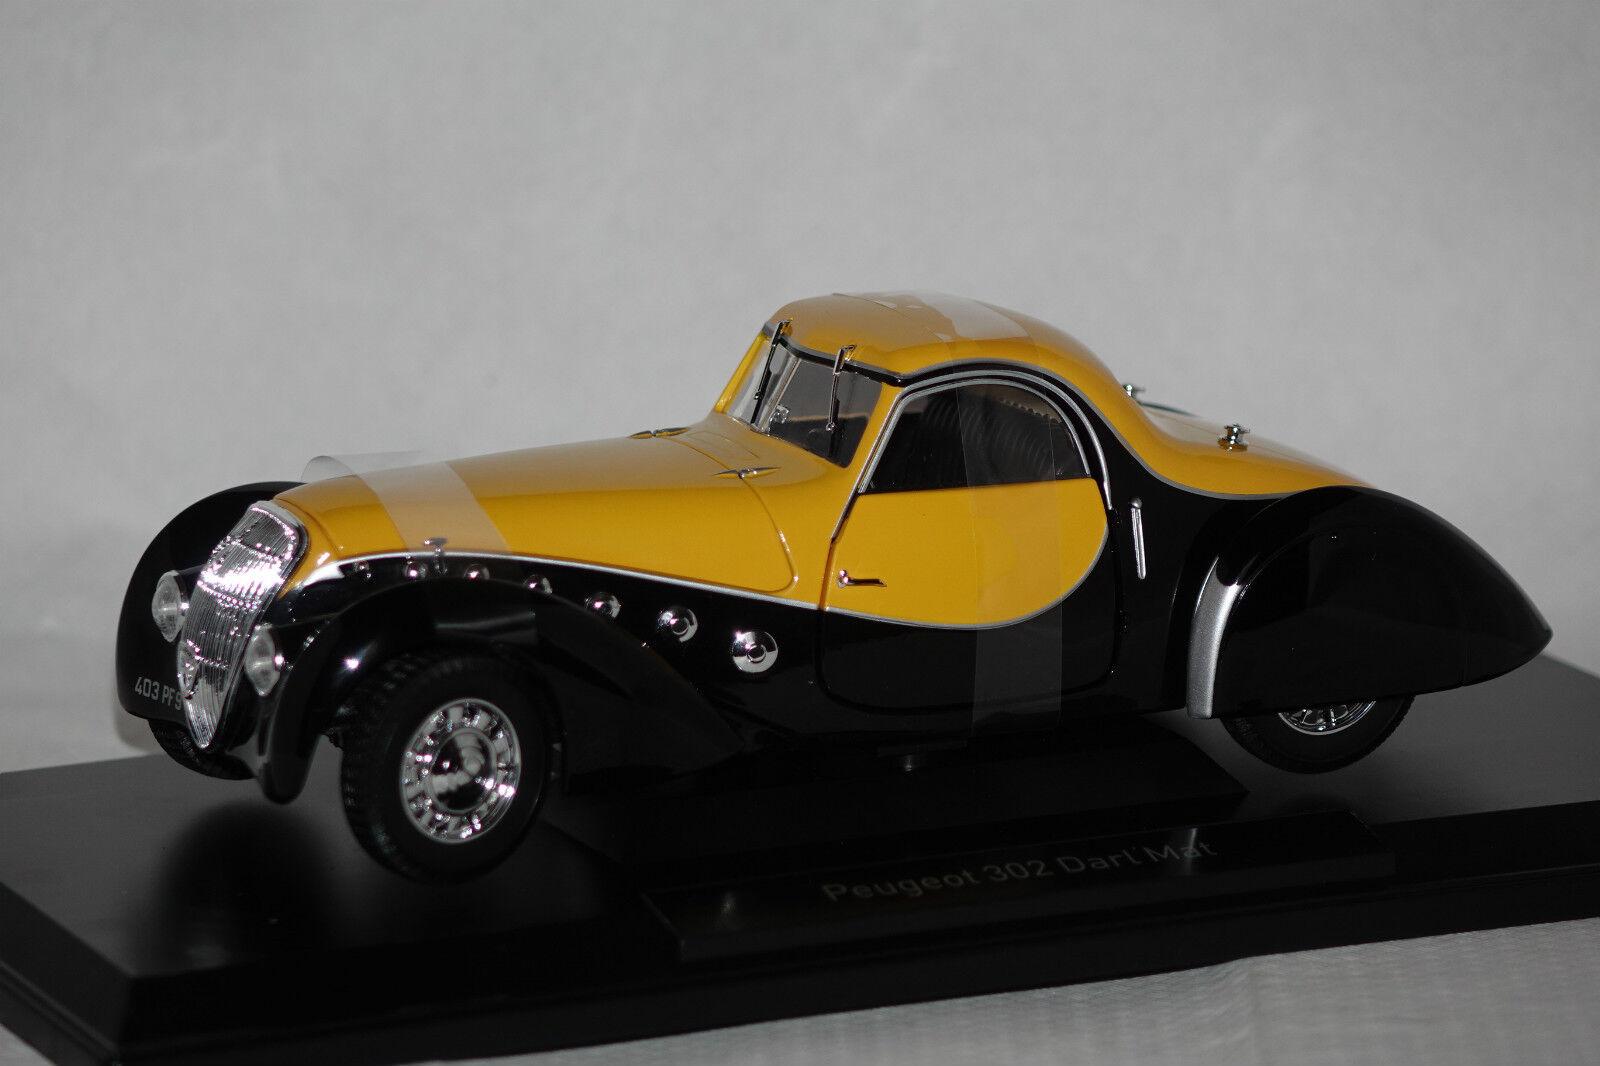 Peugeot 302 Darl`Mat Coupe 1937 noir jaune 1 18 Norev neu + OVP 184716